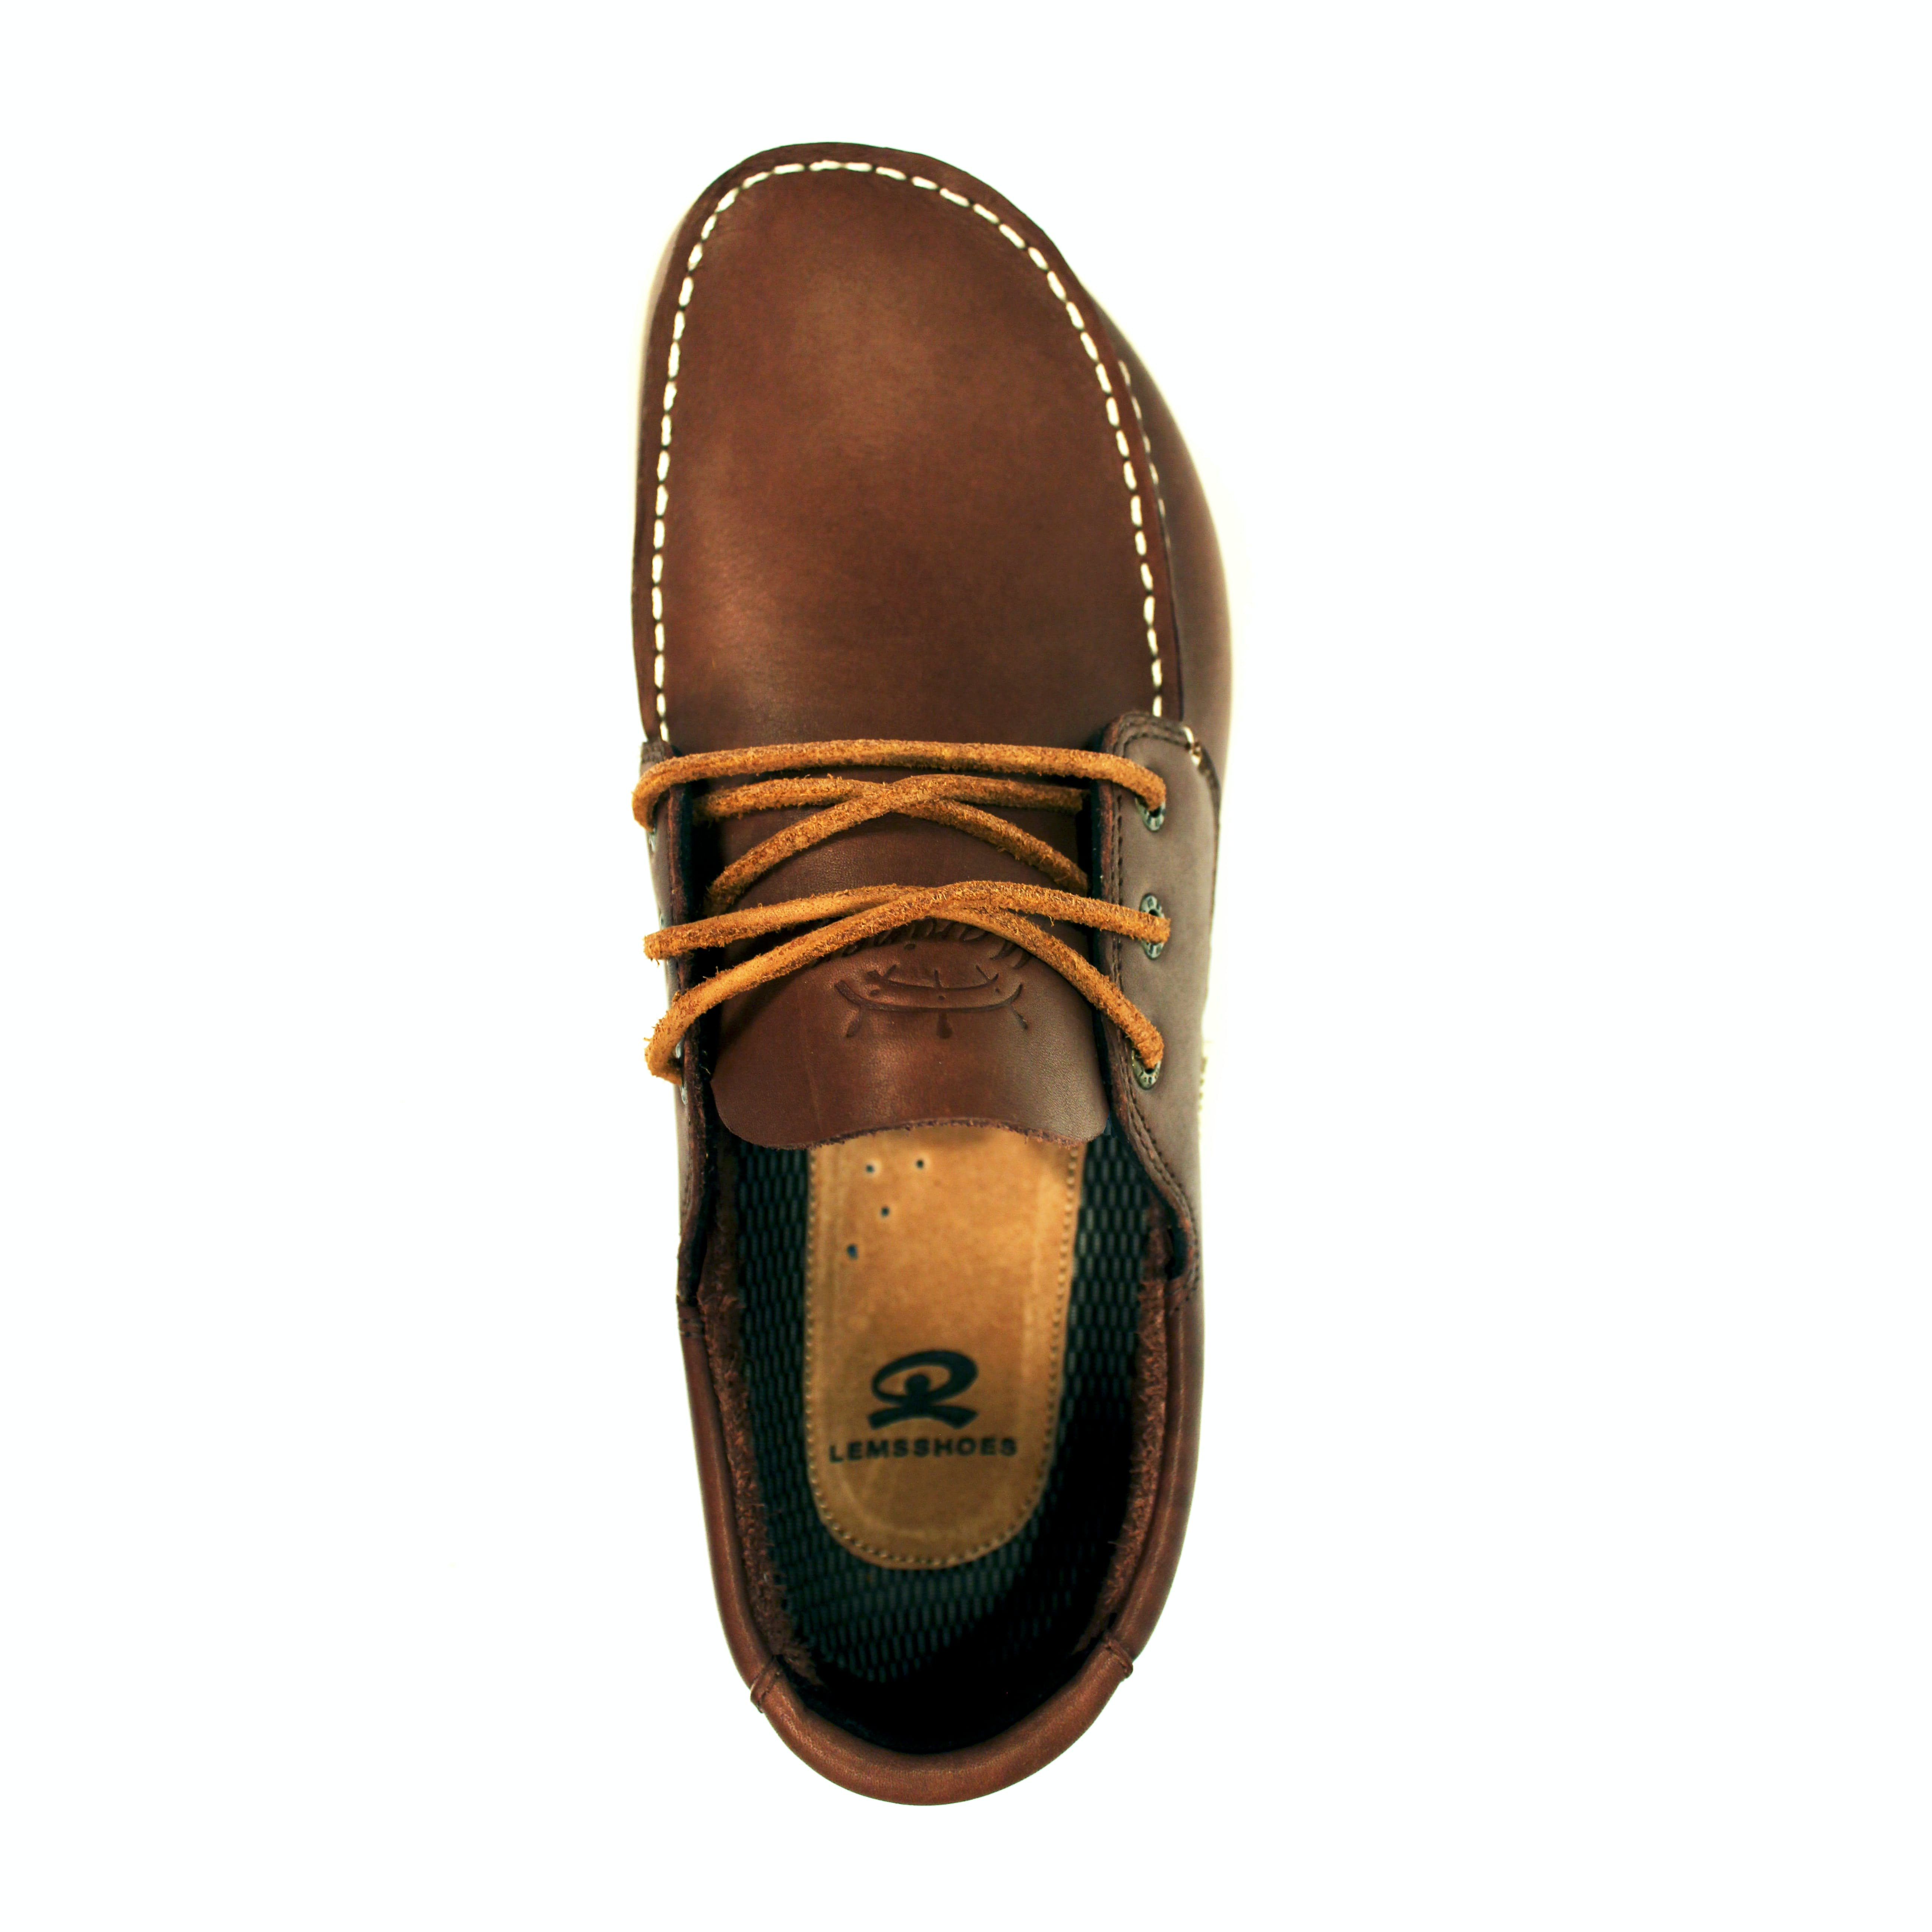 Lems Shoes Mariner Shoe Huckberry